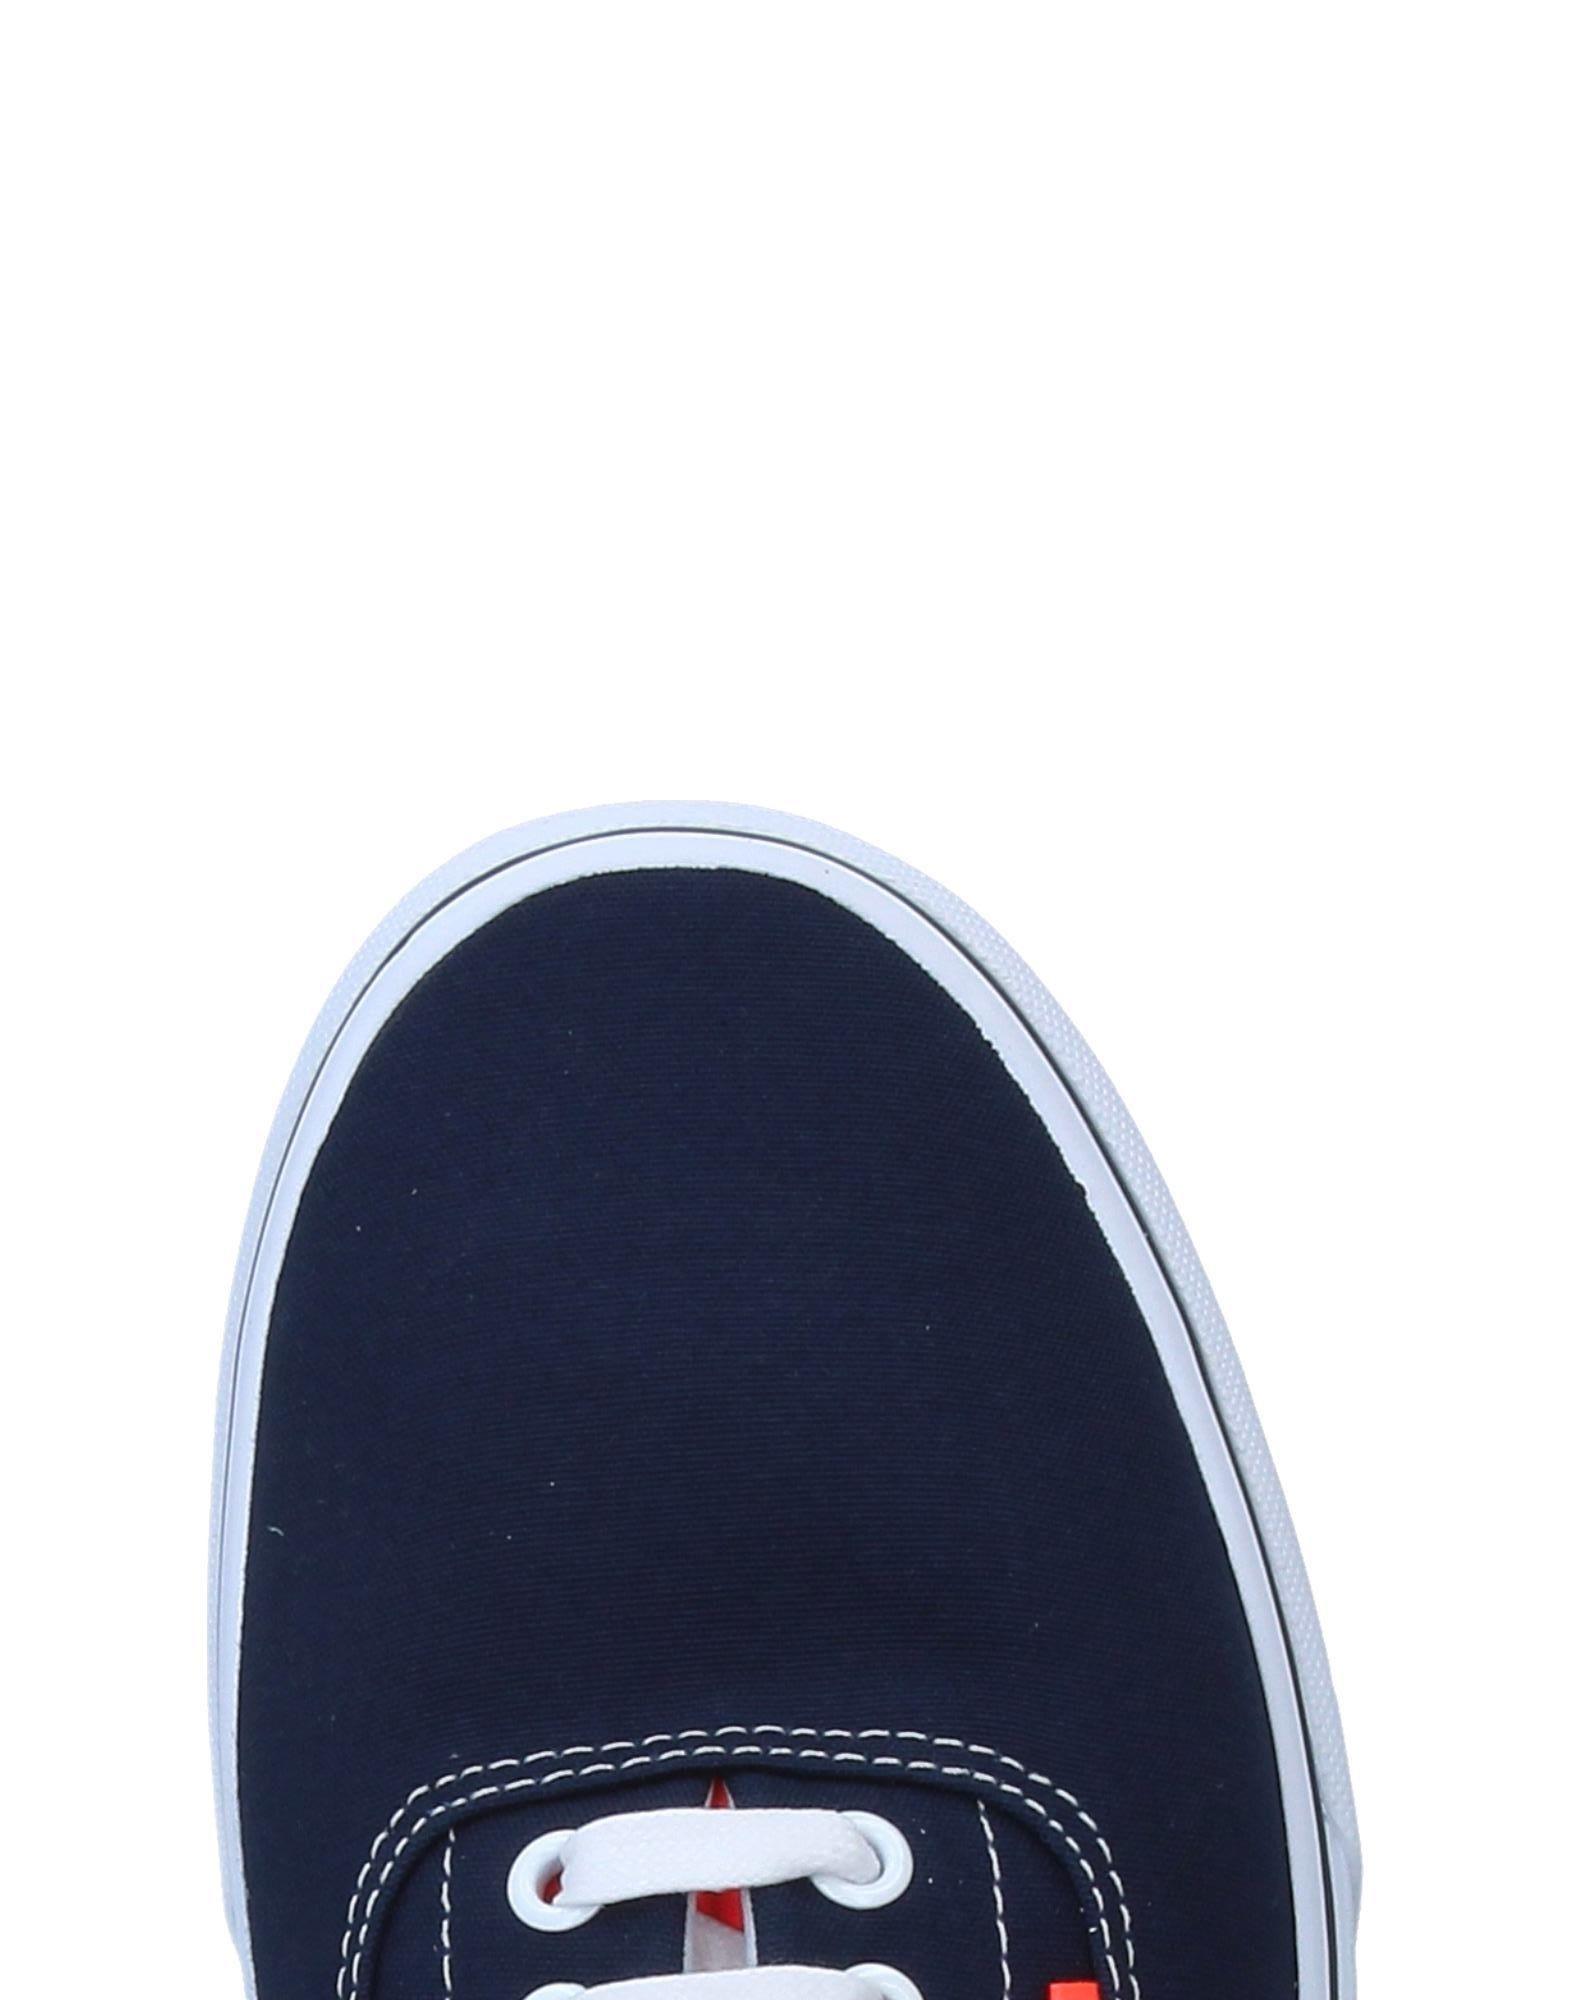 Vans Sneakers Herren  Schuhe 11354589RW Heiße Schuhe  28ae8a